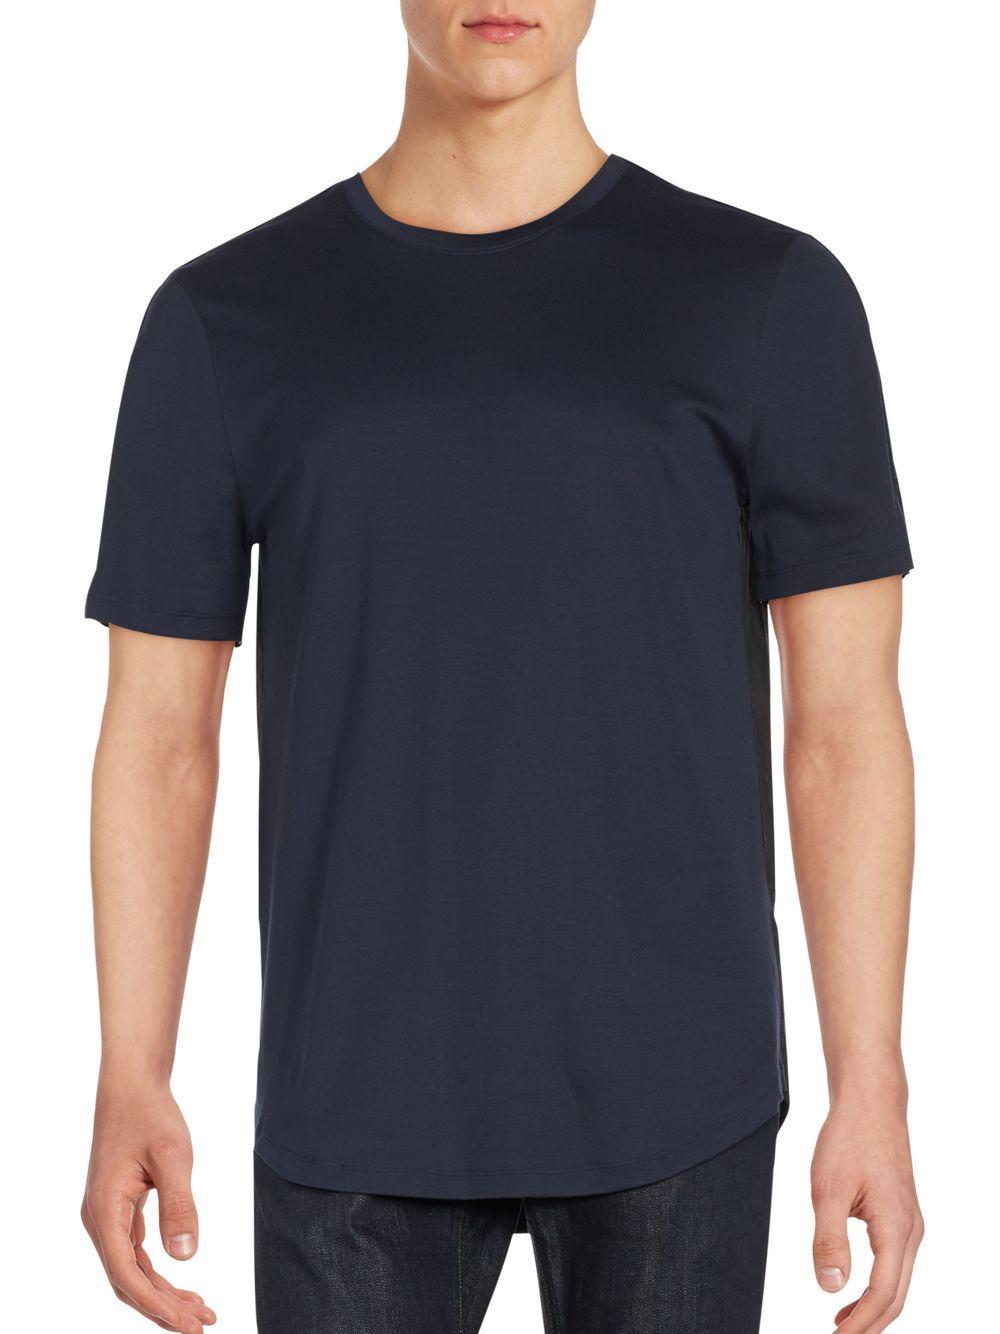 Helmut lang short sleeve roundneck t shirt in blue for men for Helmut lang tee shirts